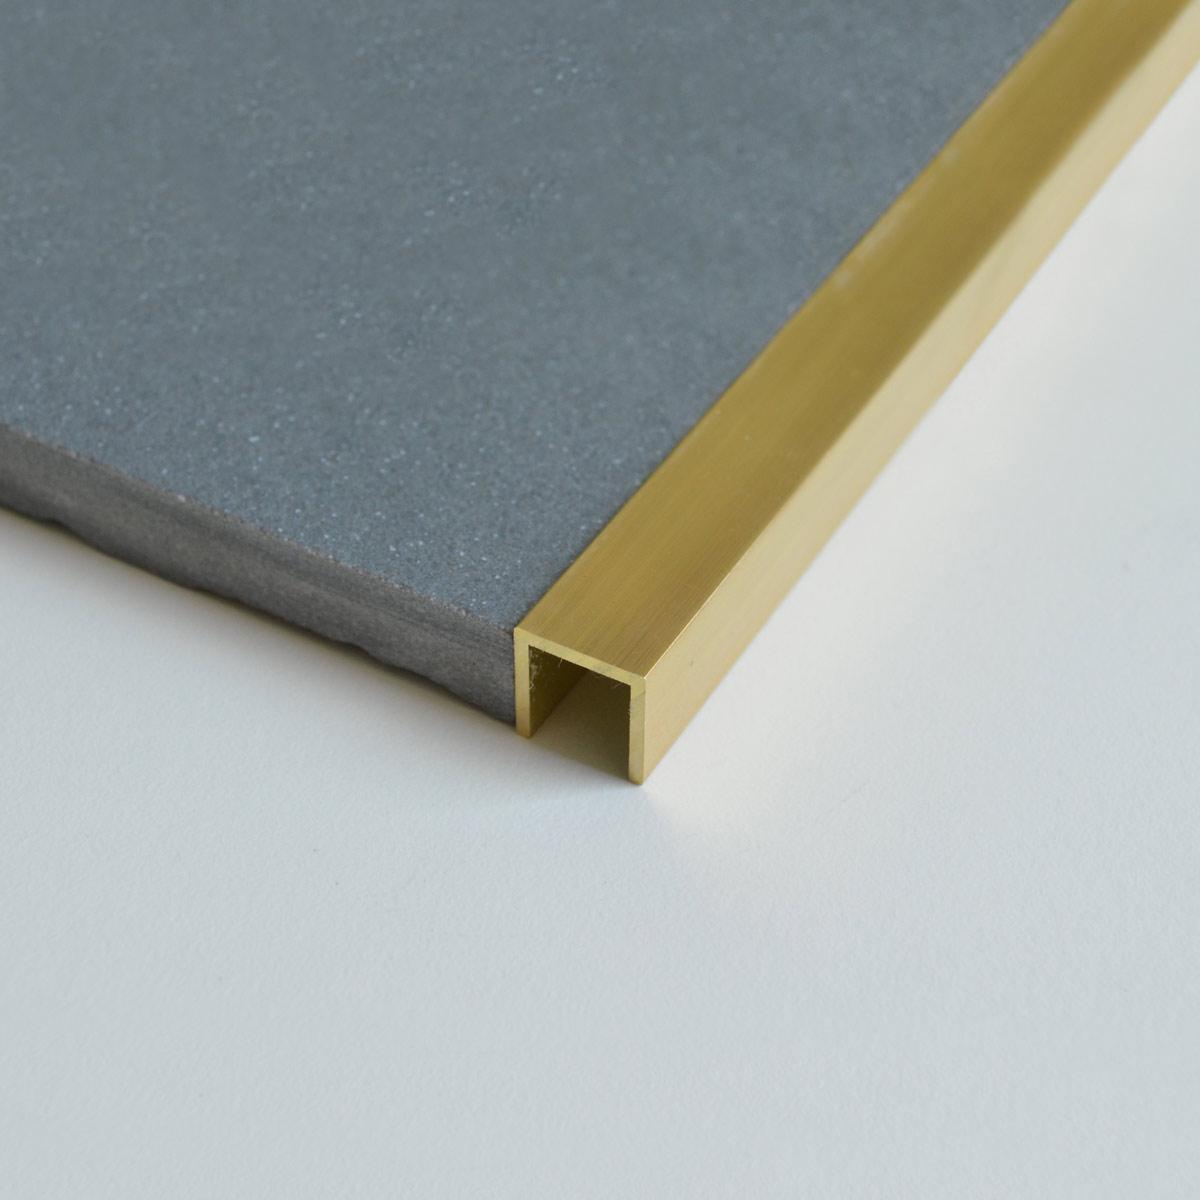 Profili per pavimenti Linetec PU 10 OL Profilitec